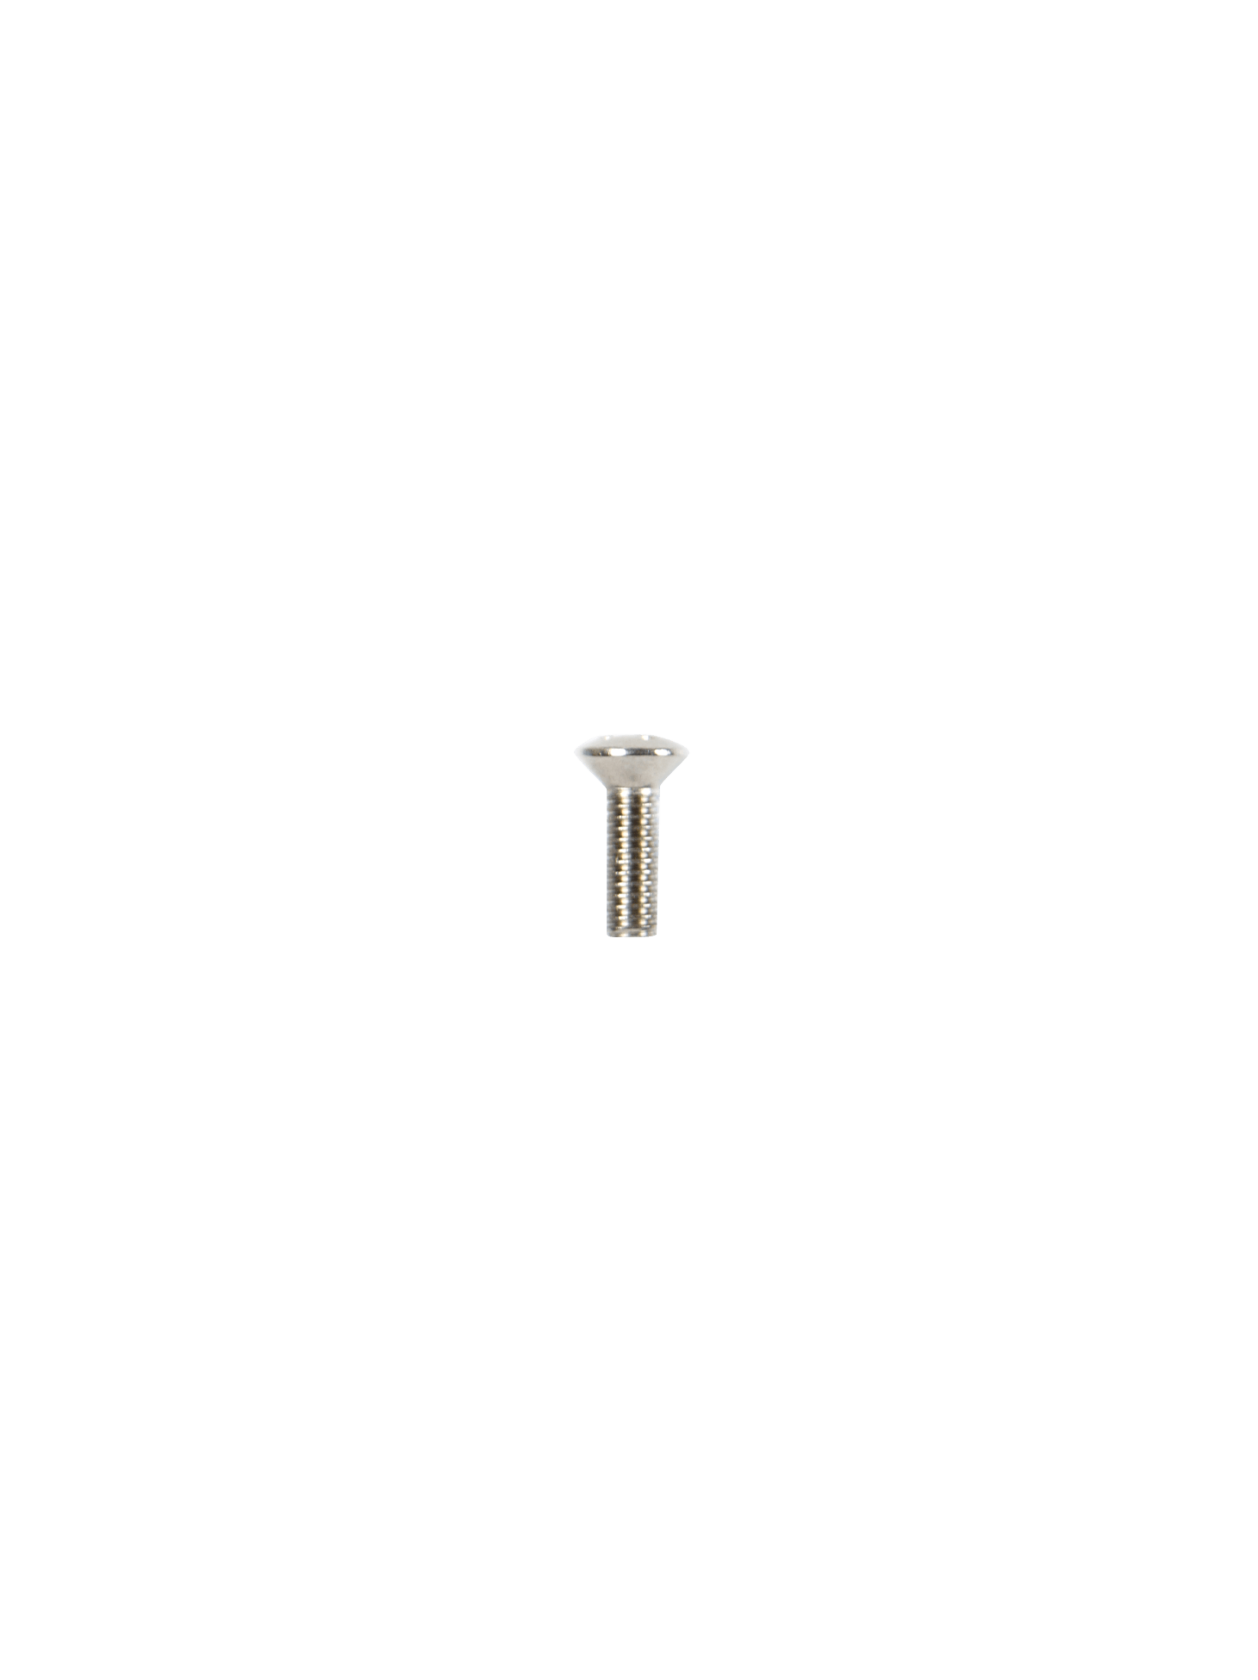 iCandy MiChair Screw M6 x 8